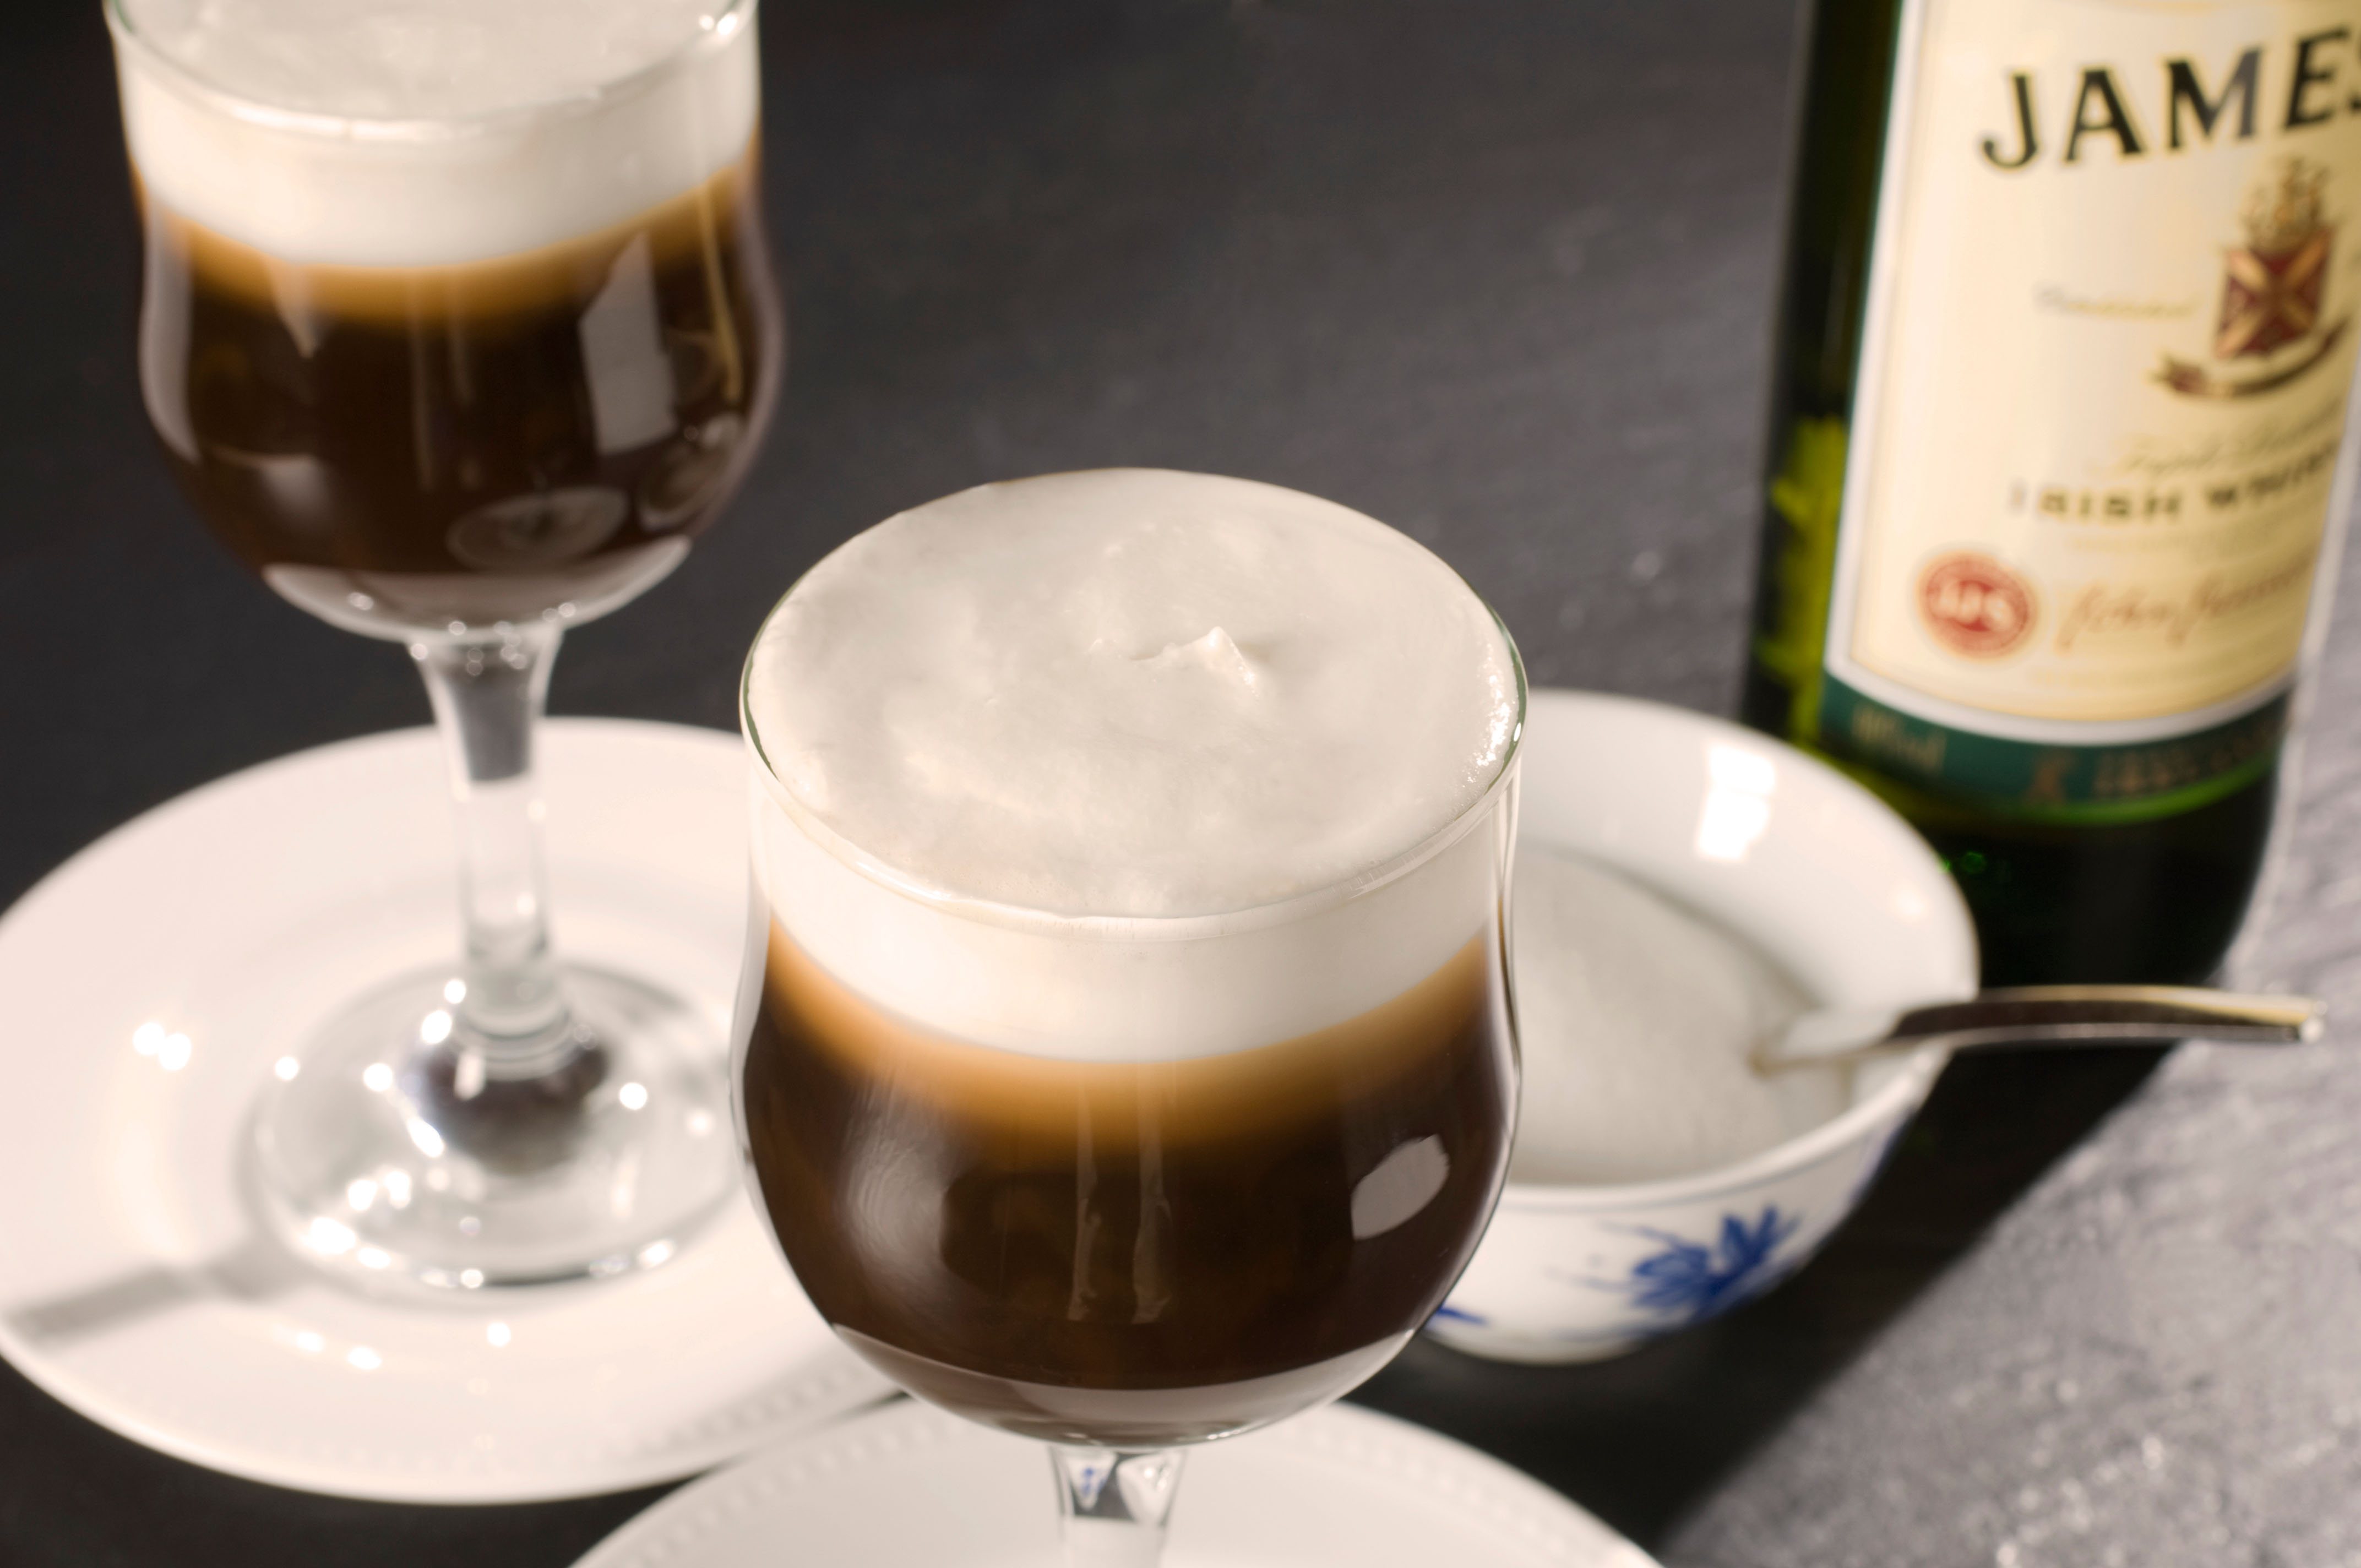 Irish coffee whiskey whisky cream glass drink Irish coffee made with coffee Irish whiskey sugar and whipped cream